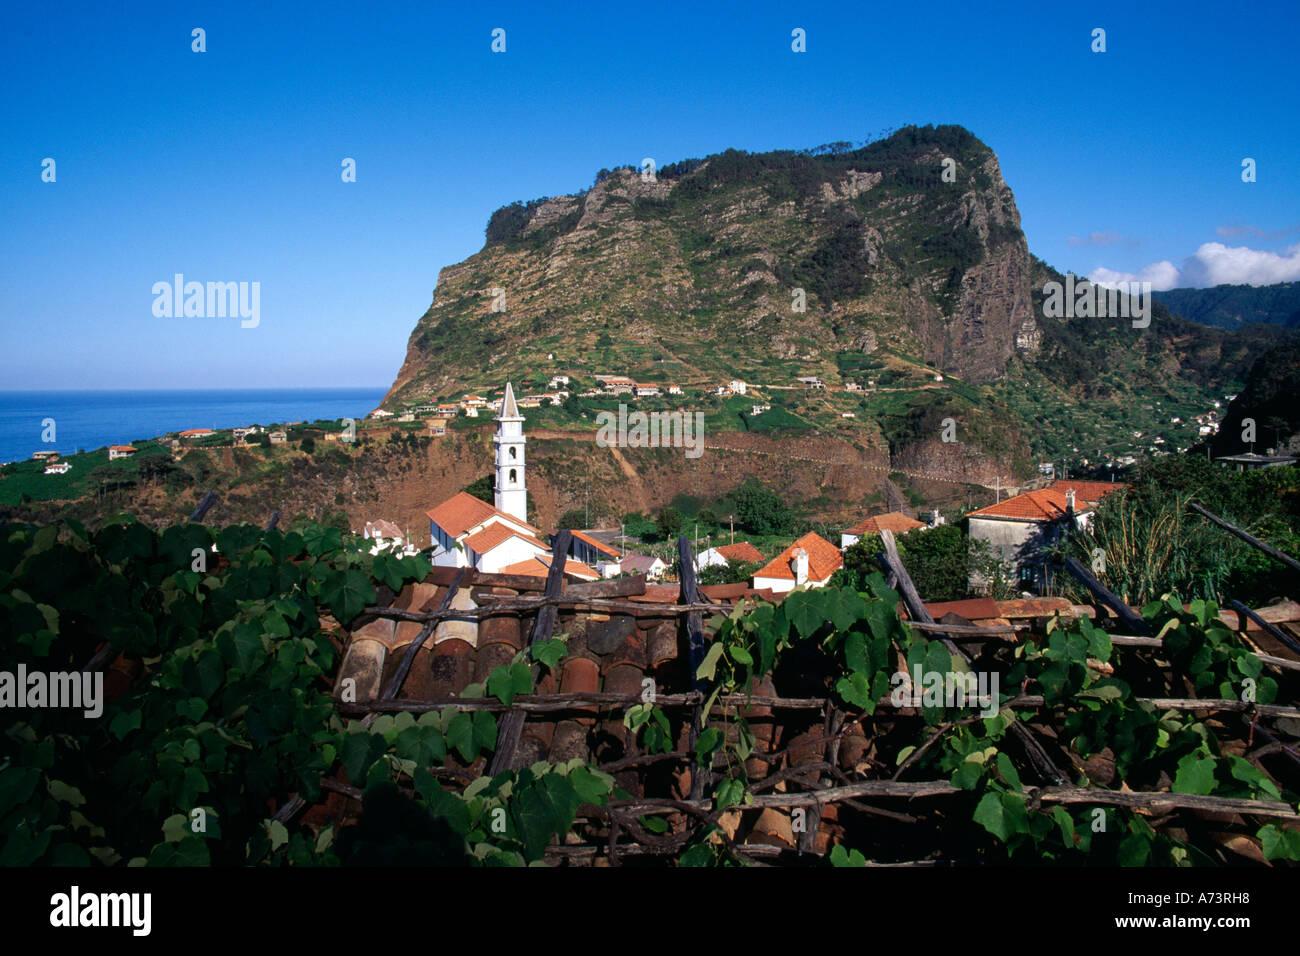 Village Church Mountain Eagle Rock Faial Madeira Portugal - Stock Image